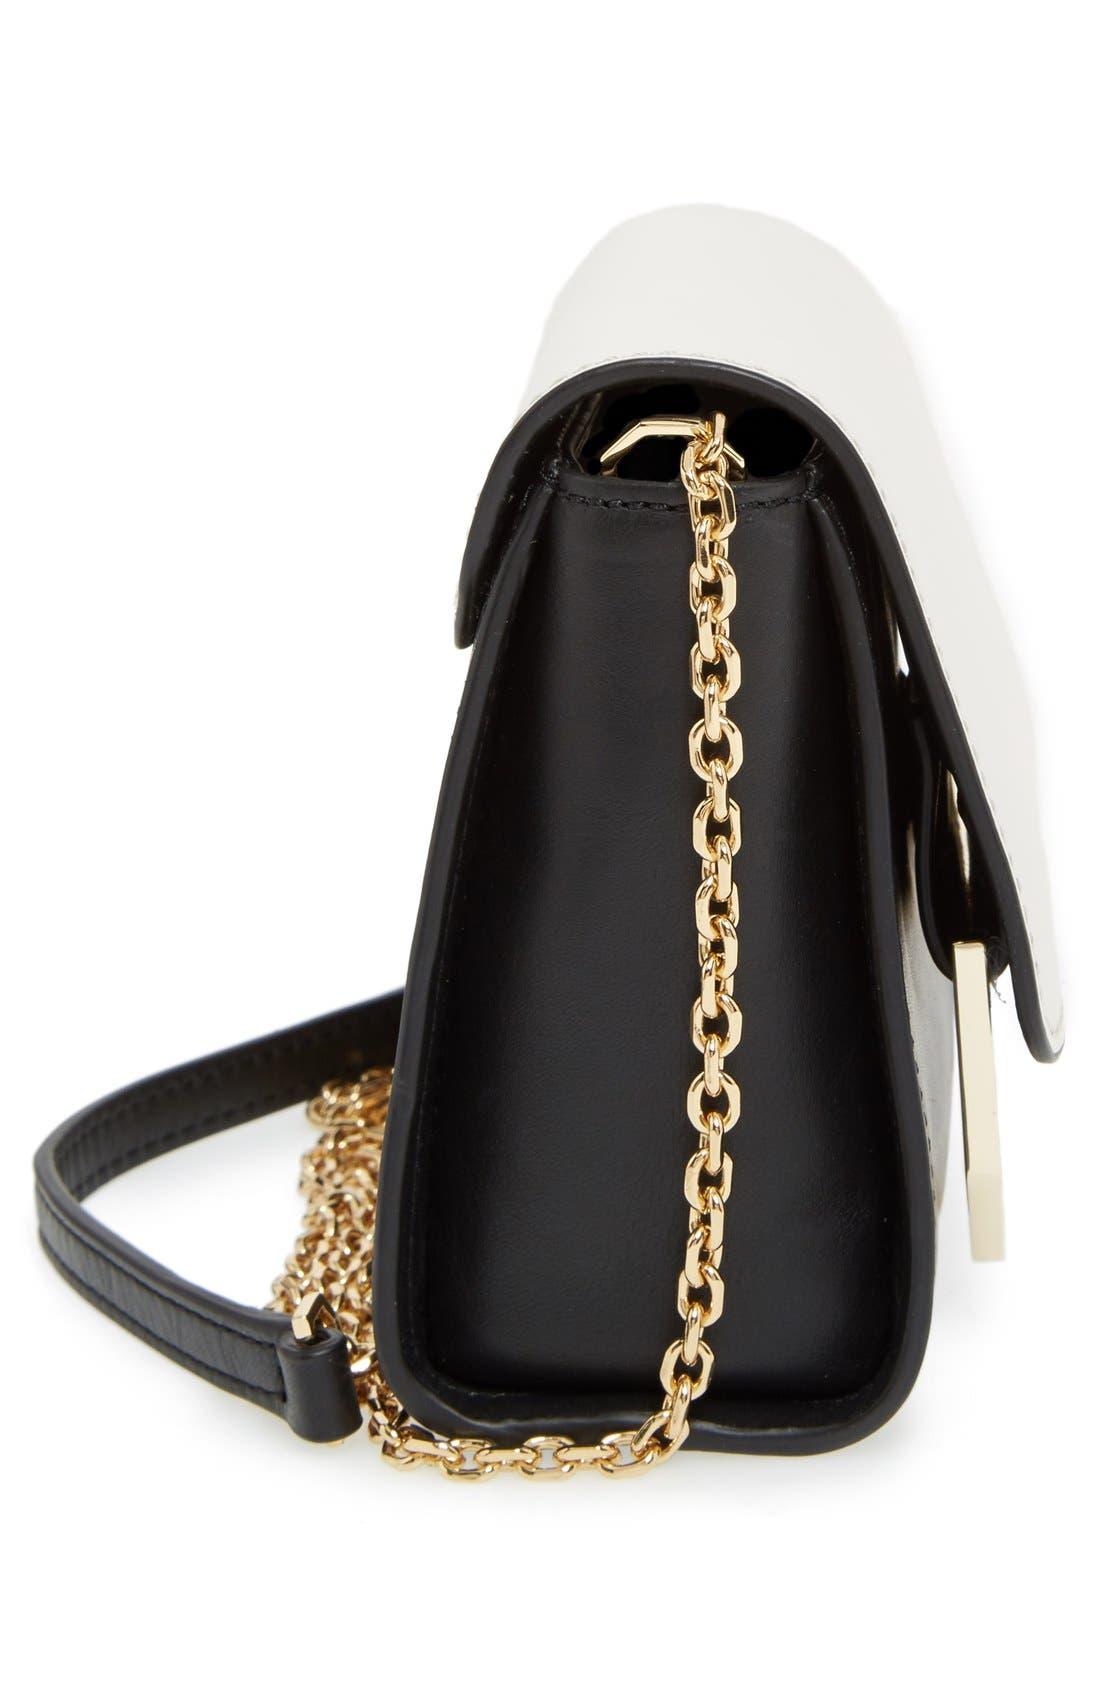 LOUISE ET CIE, 'Towa Micro' Colorblock Leather Bag, Alternate thumbnail 2, color, 100